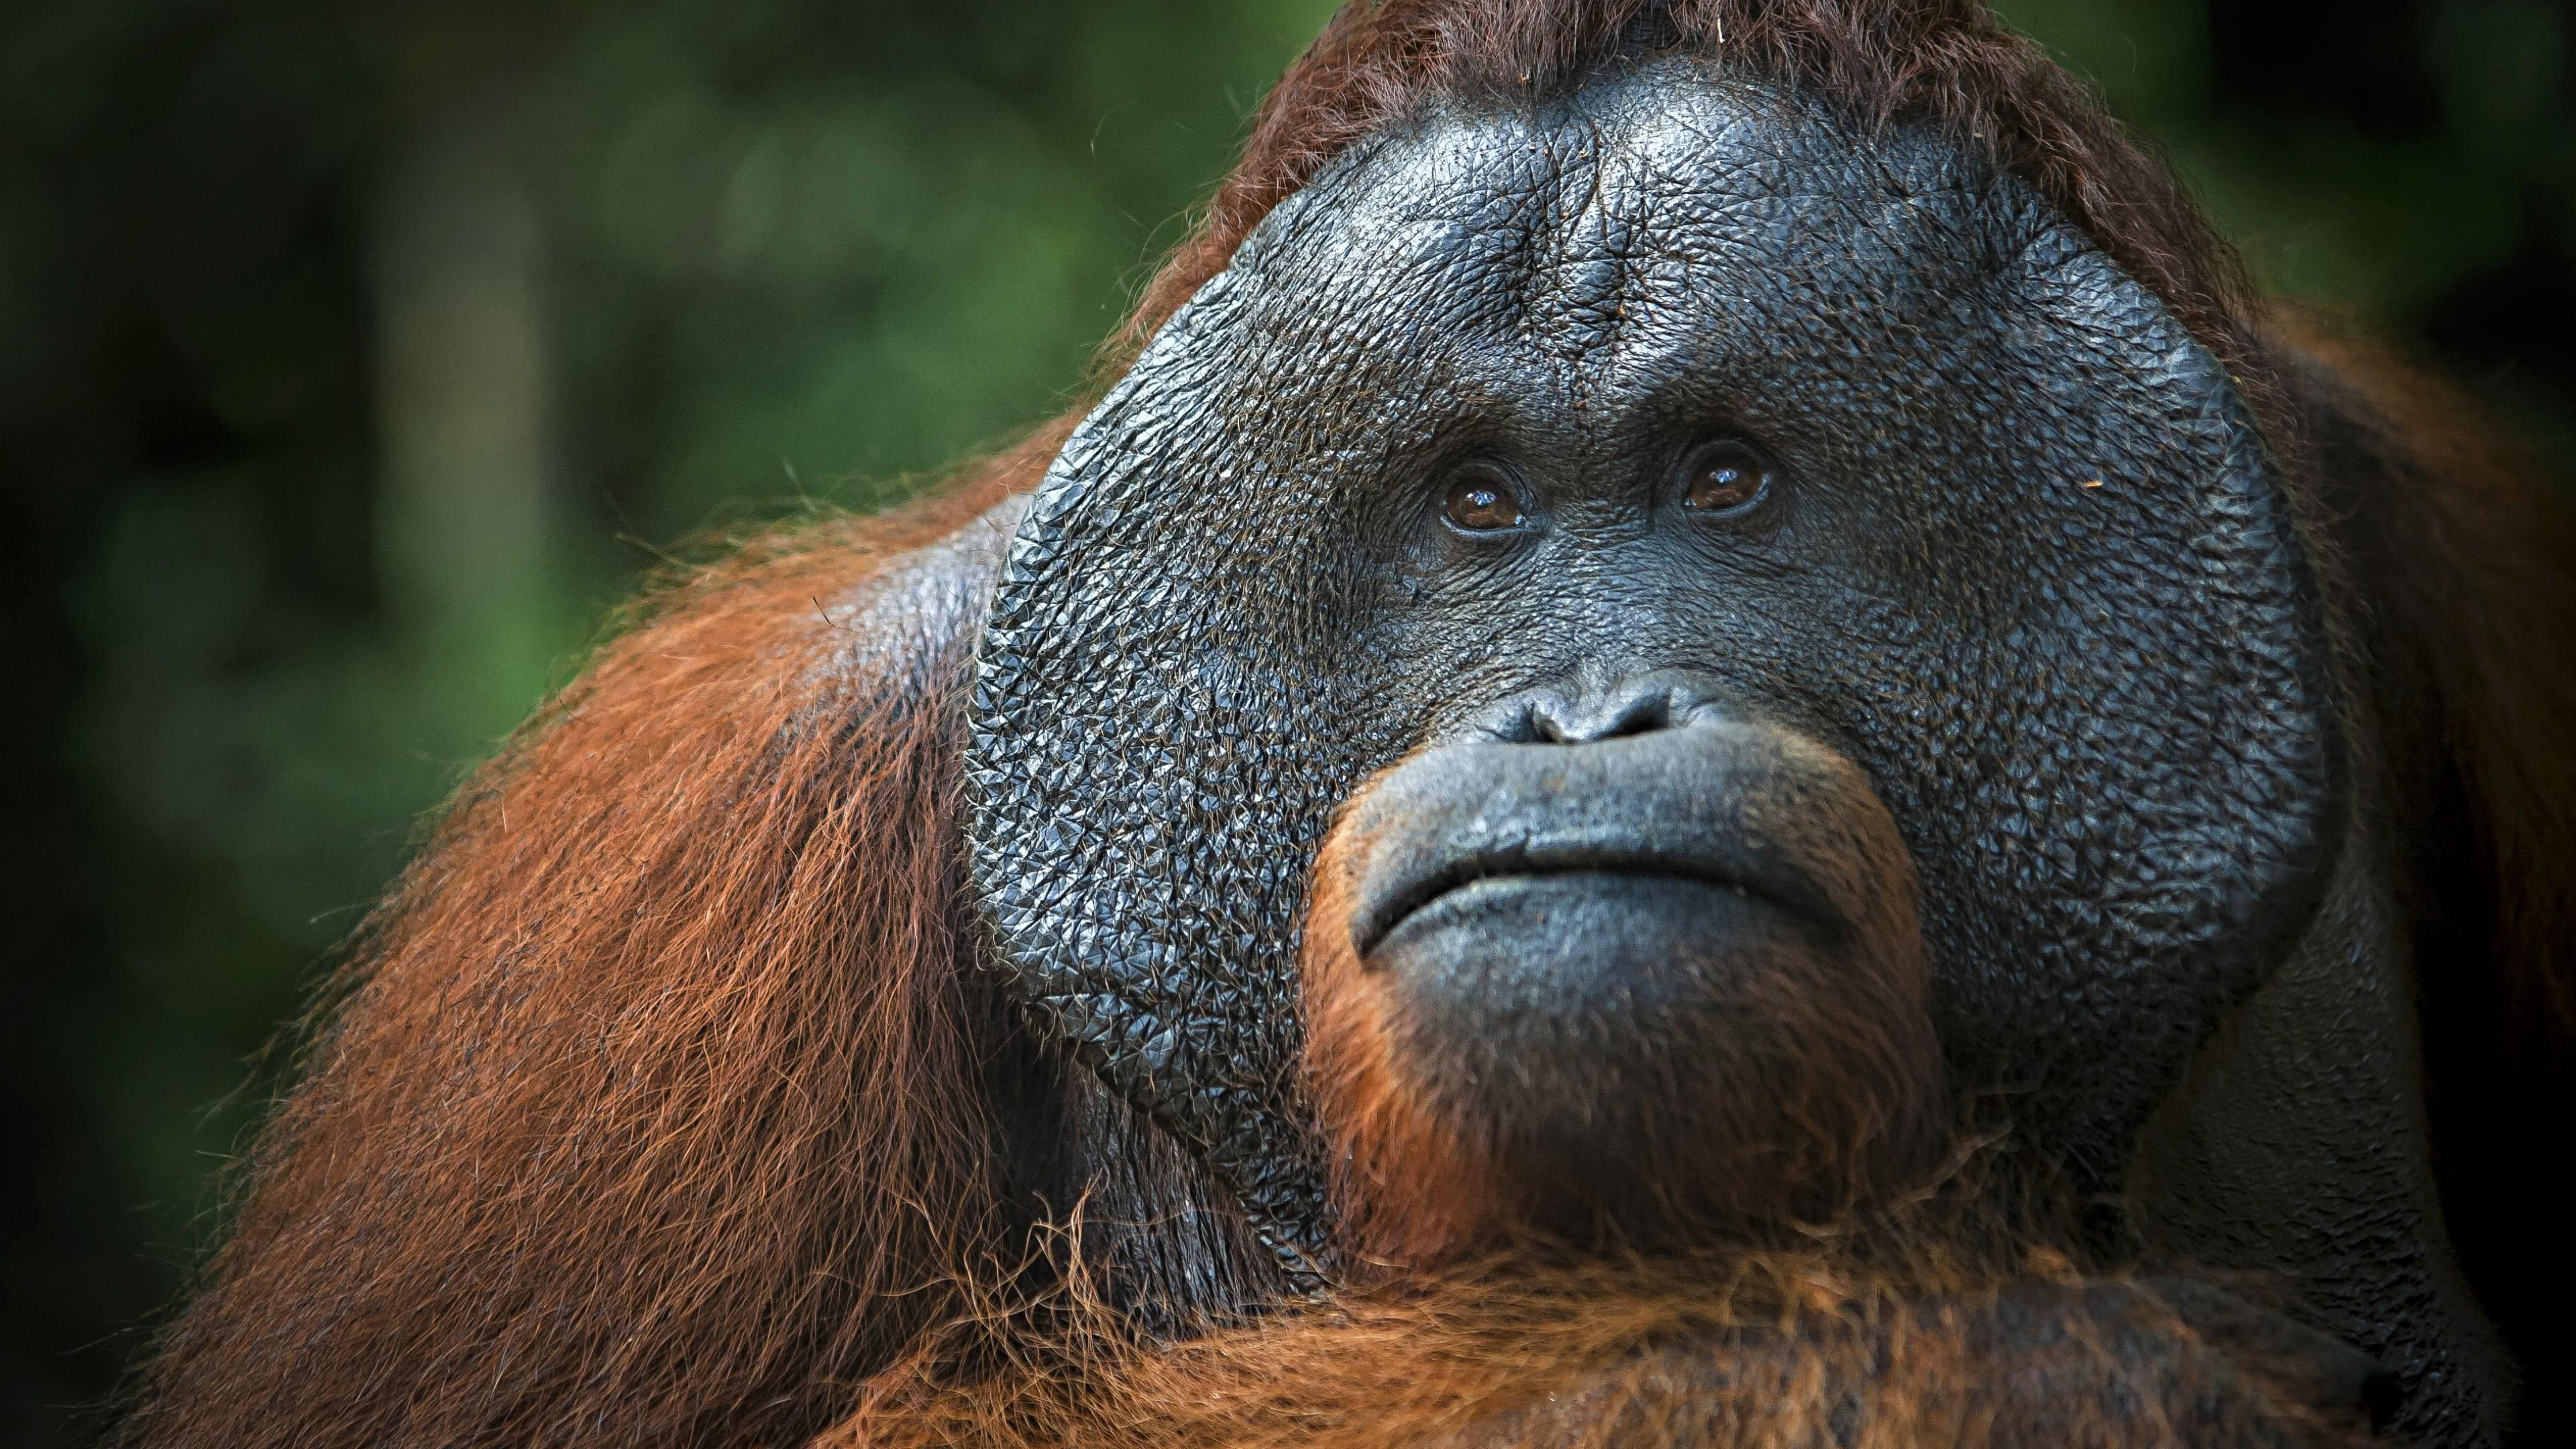 Golden Snub Nose Monkeys Uhd 4k Wallpaper - 4k Ultra Orangutan 4k , HD Wallpaper & Backgrounds